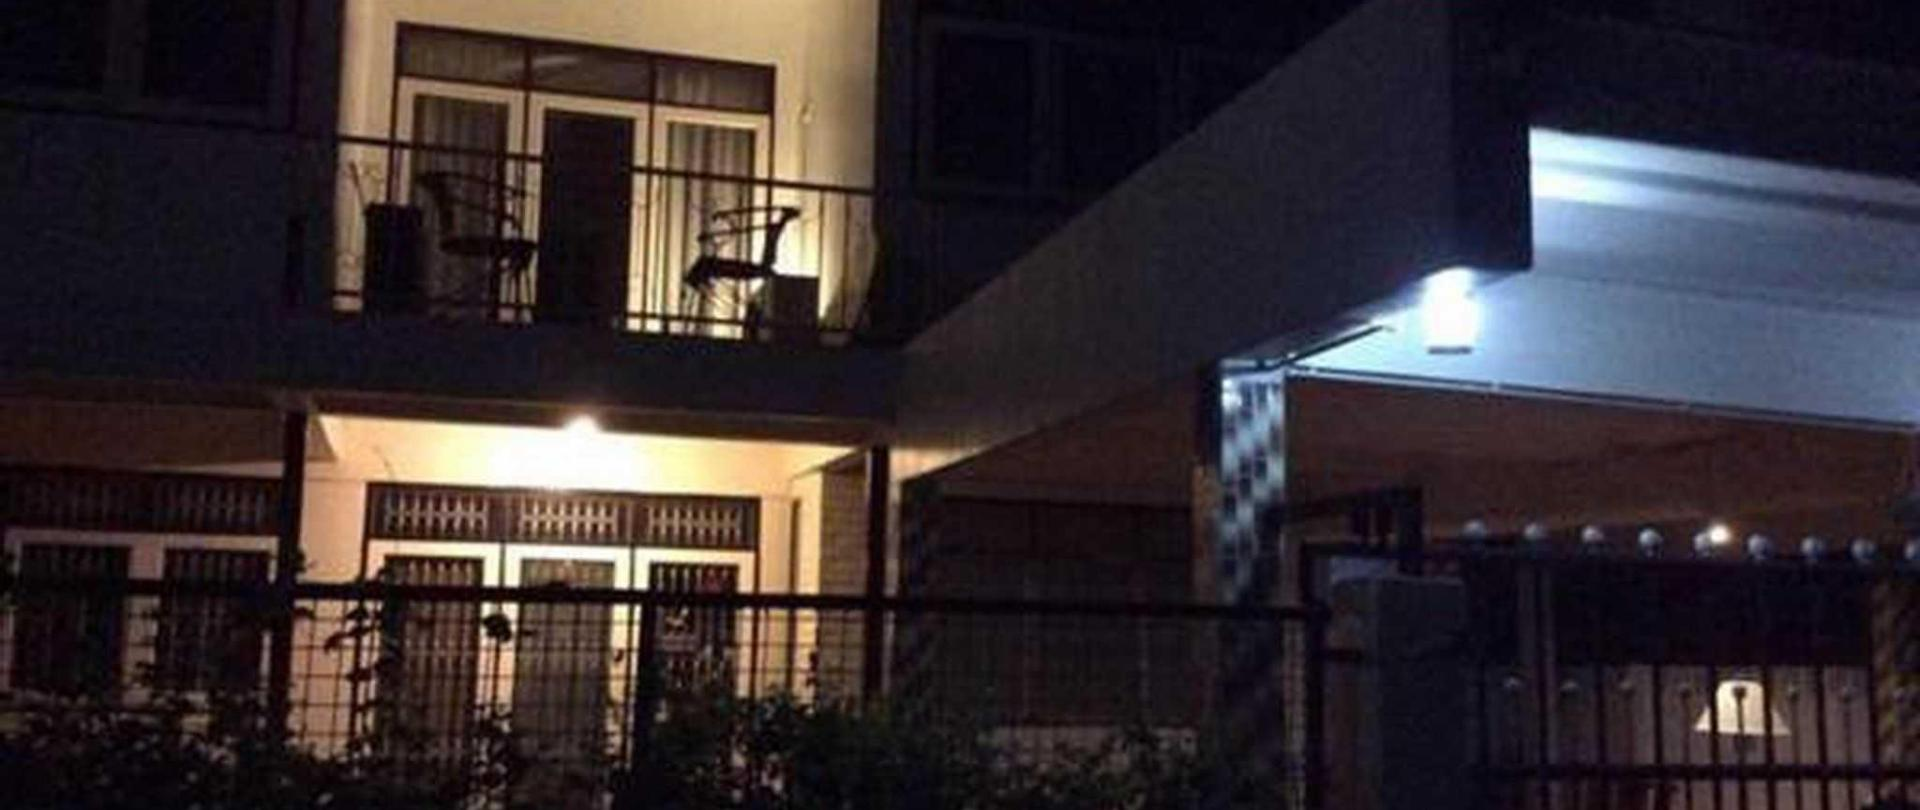 house-front-night-time-vdo.jpg